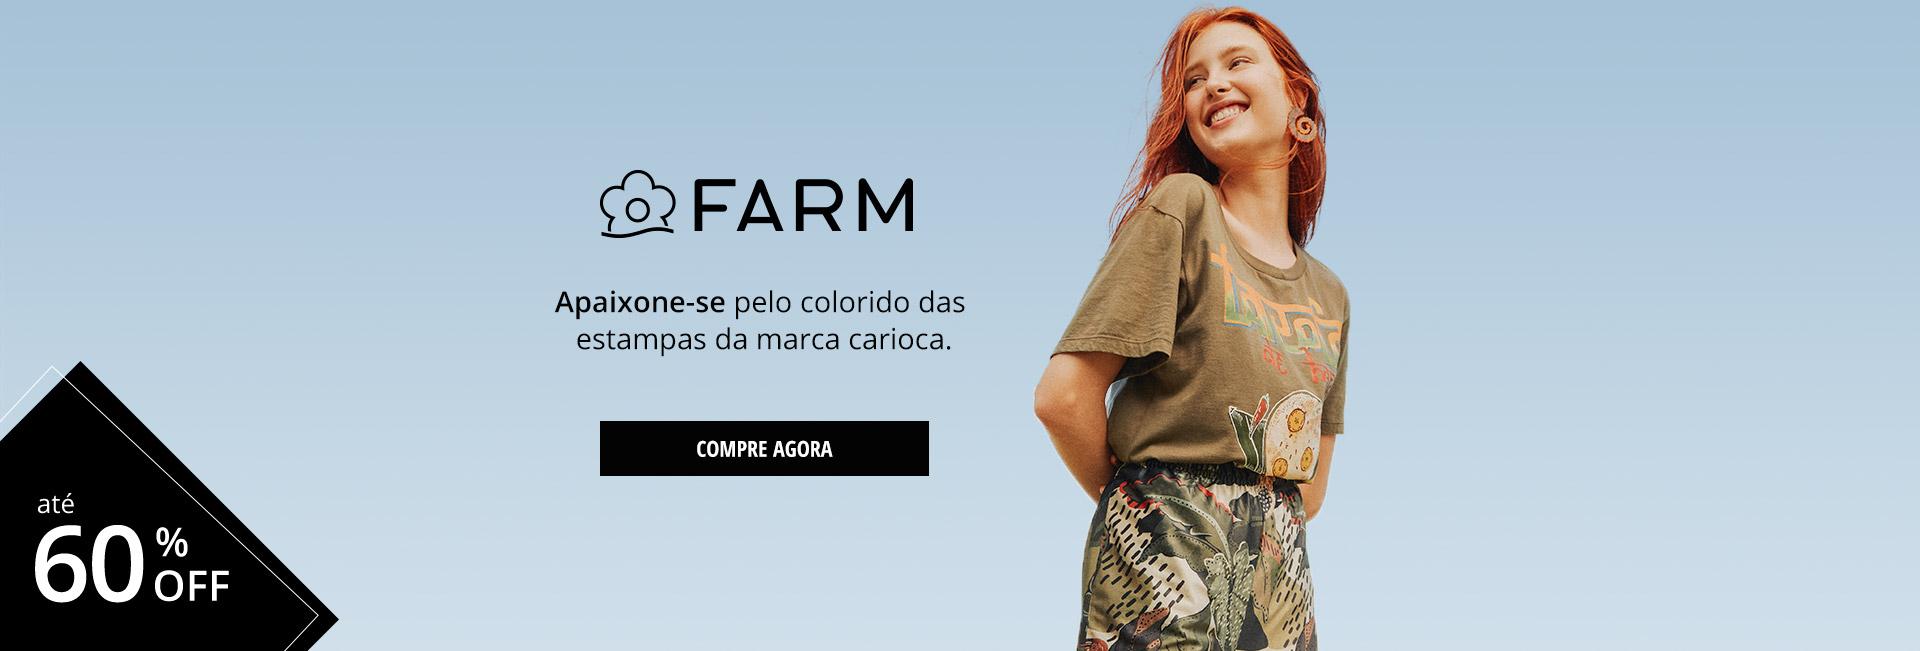 Farm genérico